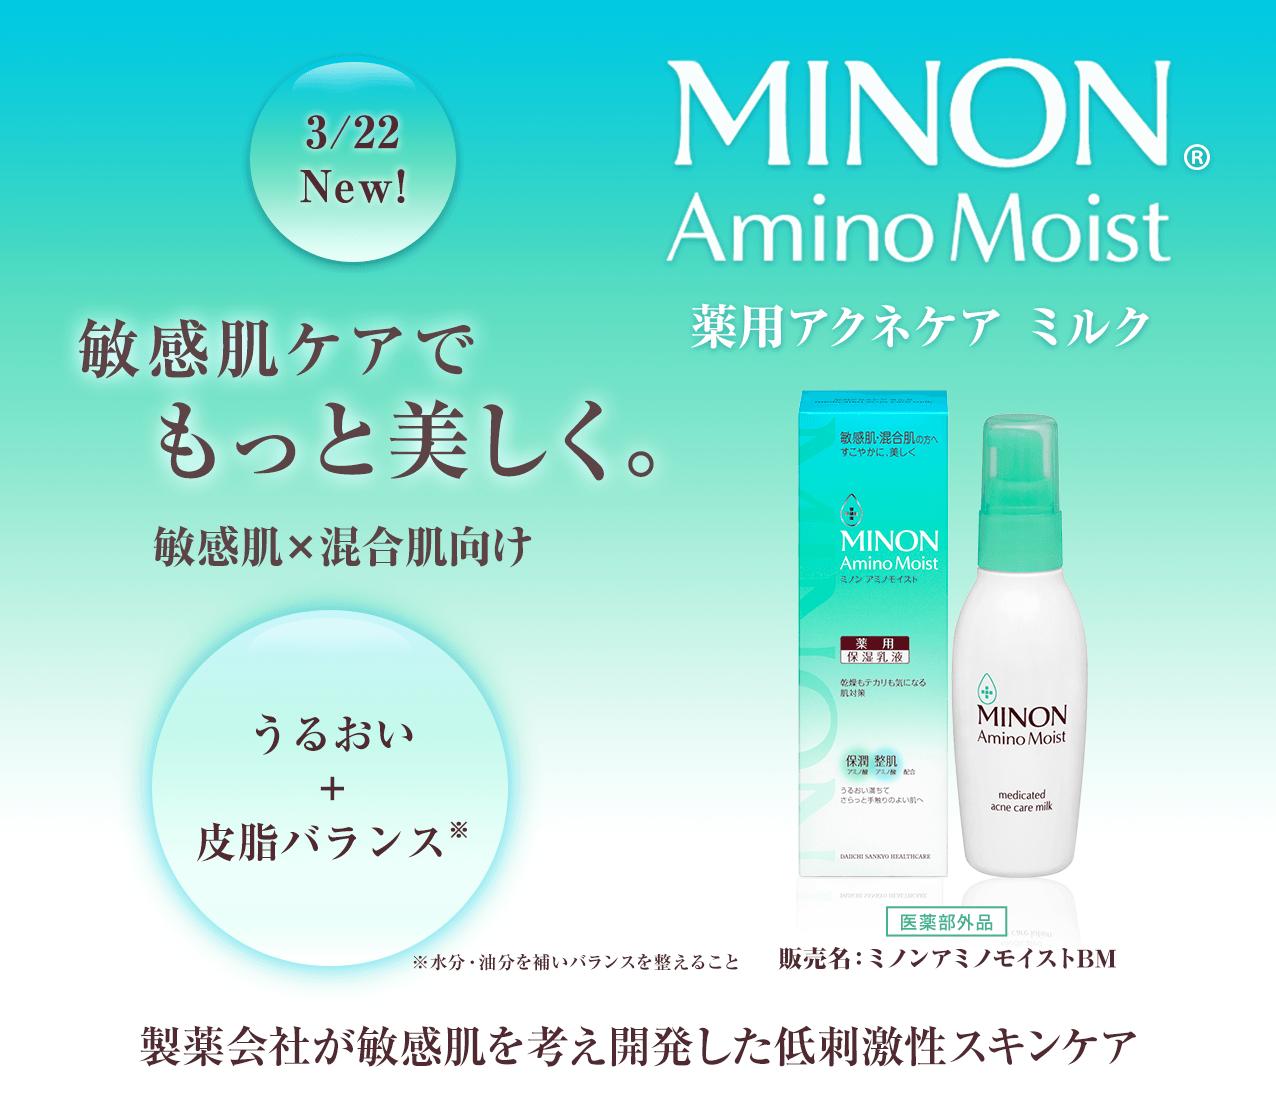 3/22 New! MINON amino moist 薬用アクネケア ミルク 敏感肌ケアでもっと美しく。敏感肌×混合肌の方向け うるおい+皮脂バランス 製薬会社が敏感肌を考え開発した低刺激性スキンケア